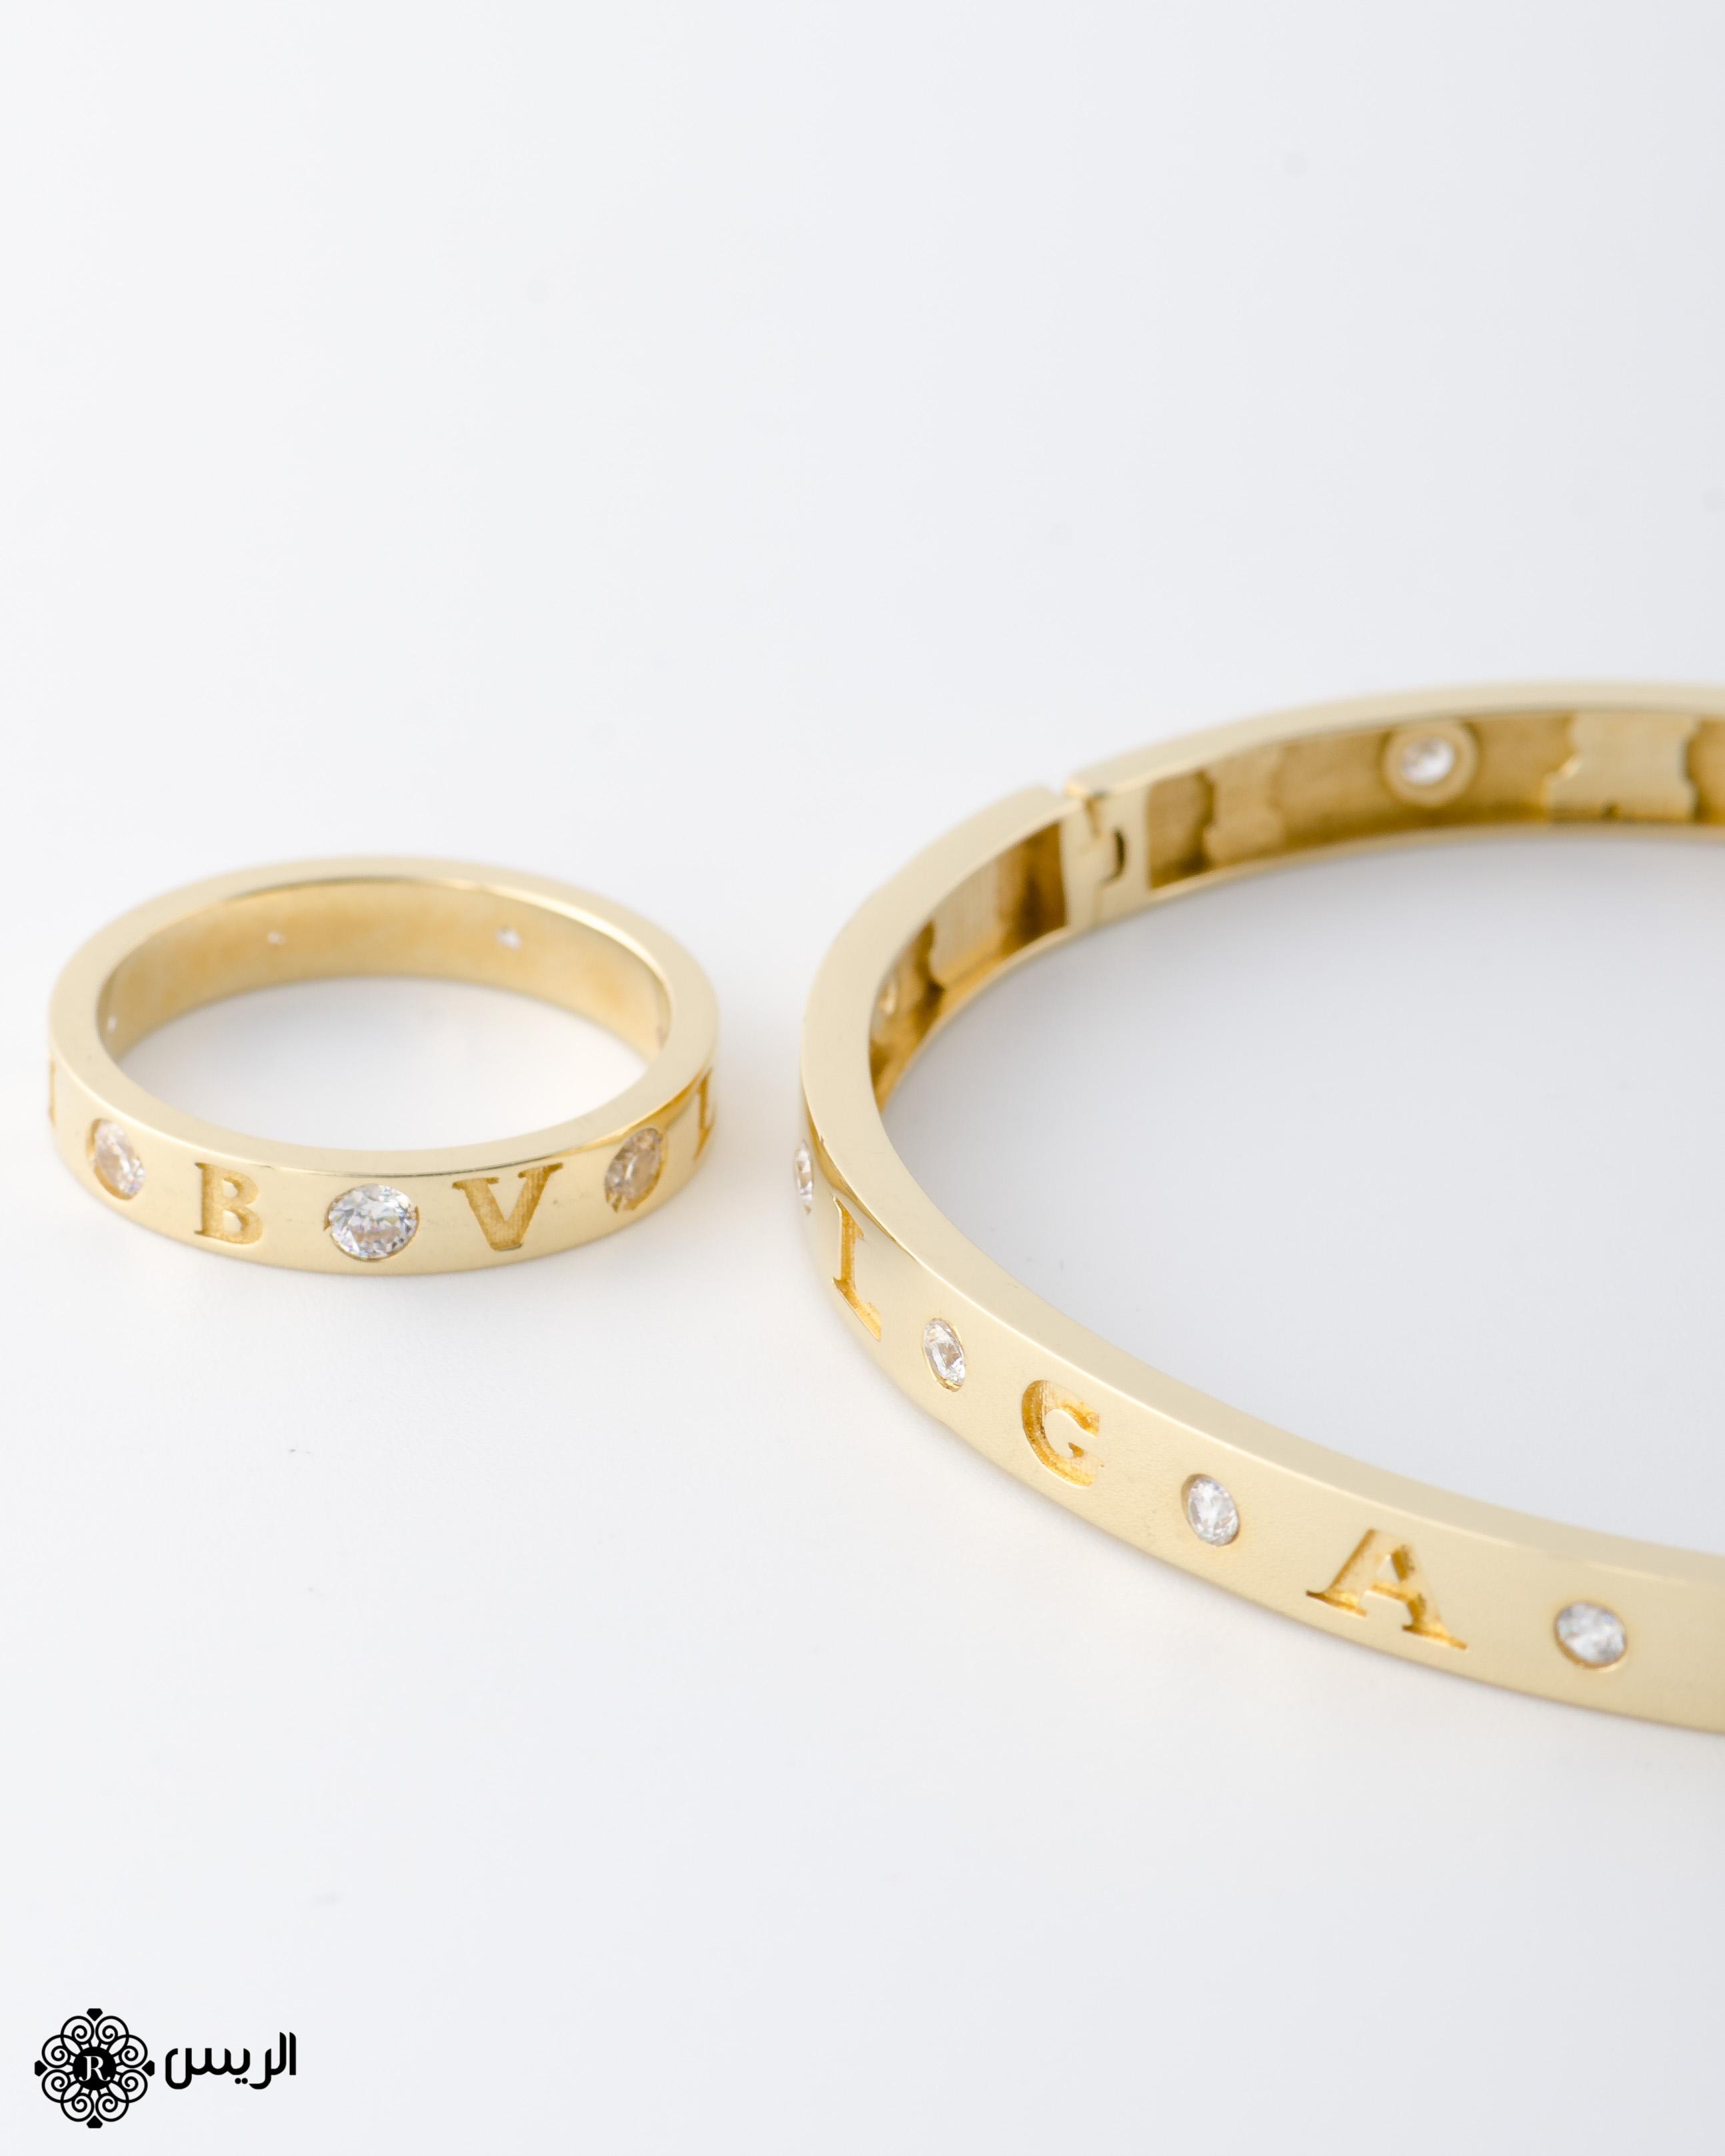 Raies jewelry Bangle with Ring Casual Design إسورة مع خاتم تصميم سبور الريس للمجوهرات